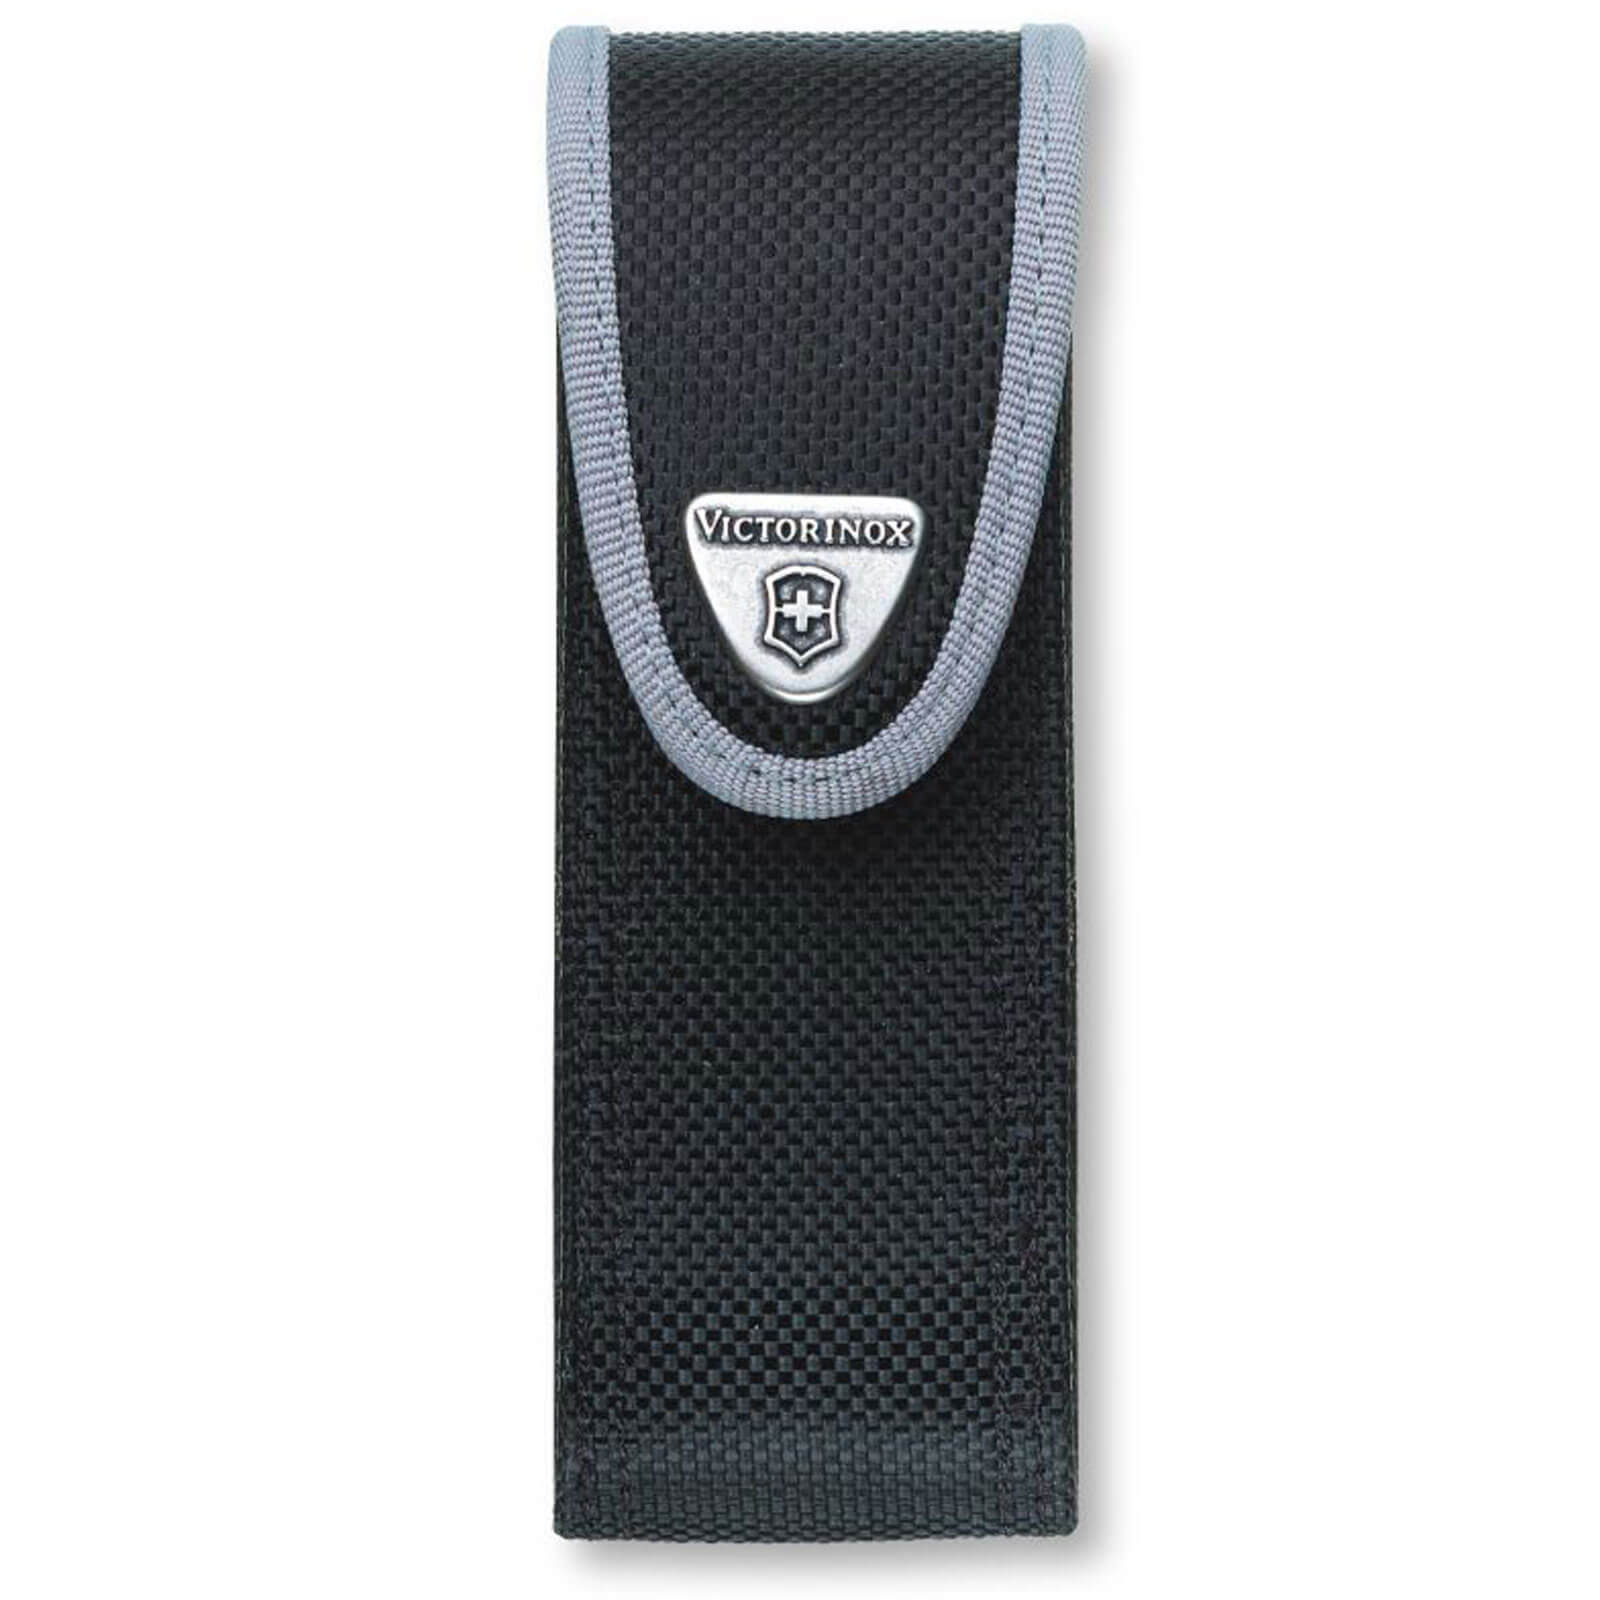 Image of Victorinox Black Nylon Pouch for Swisstool